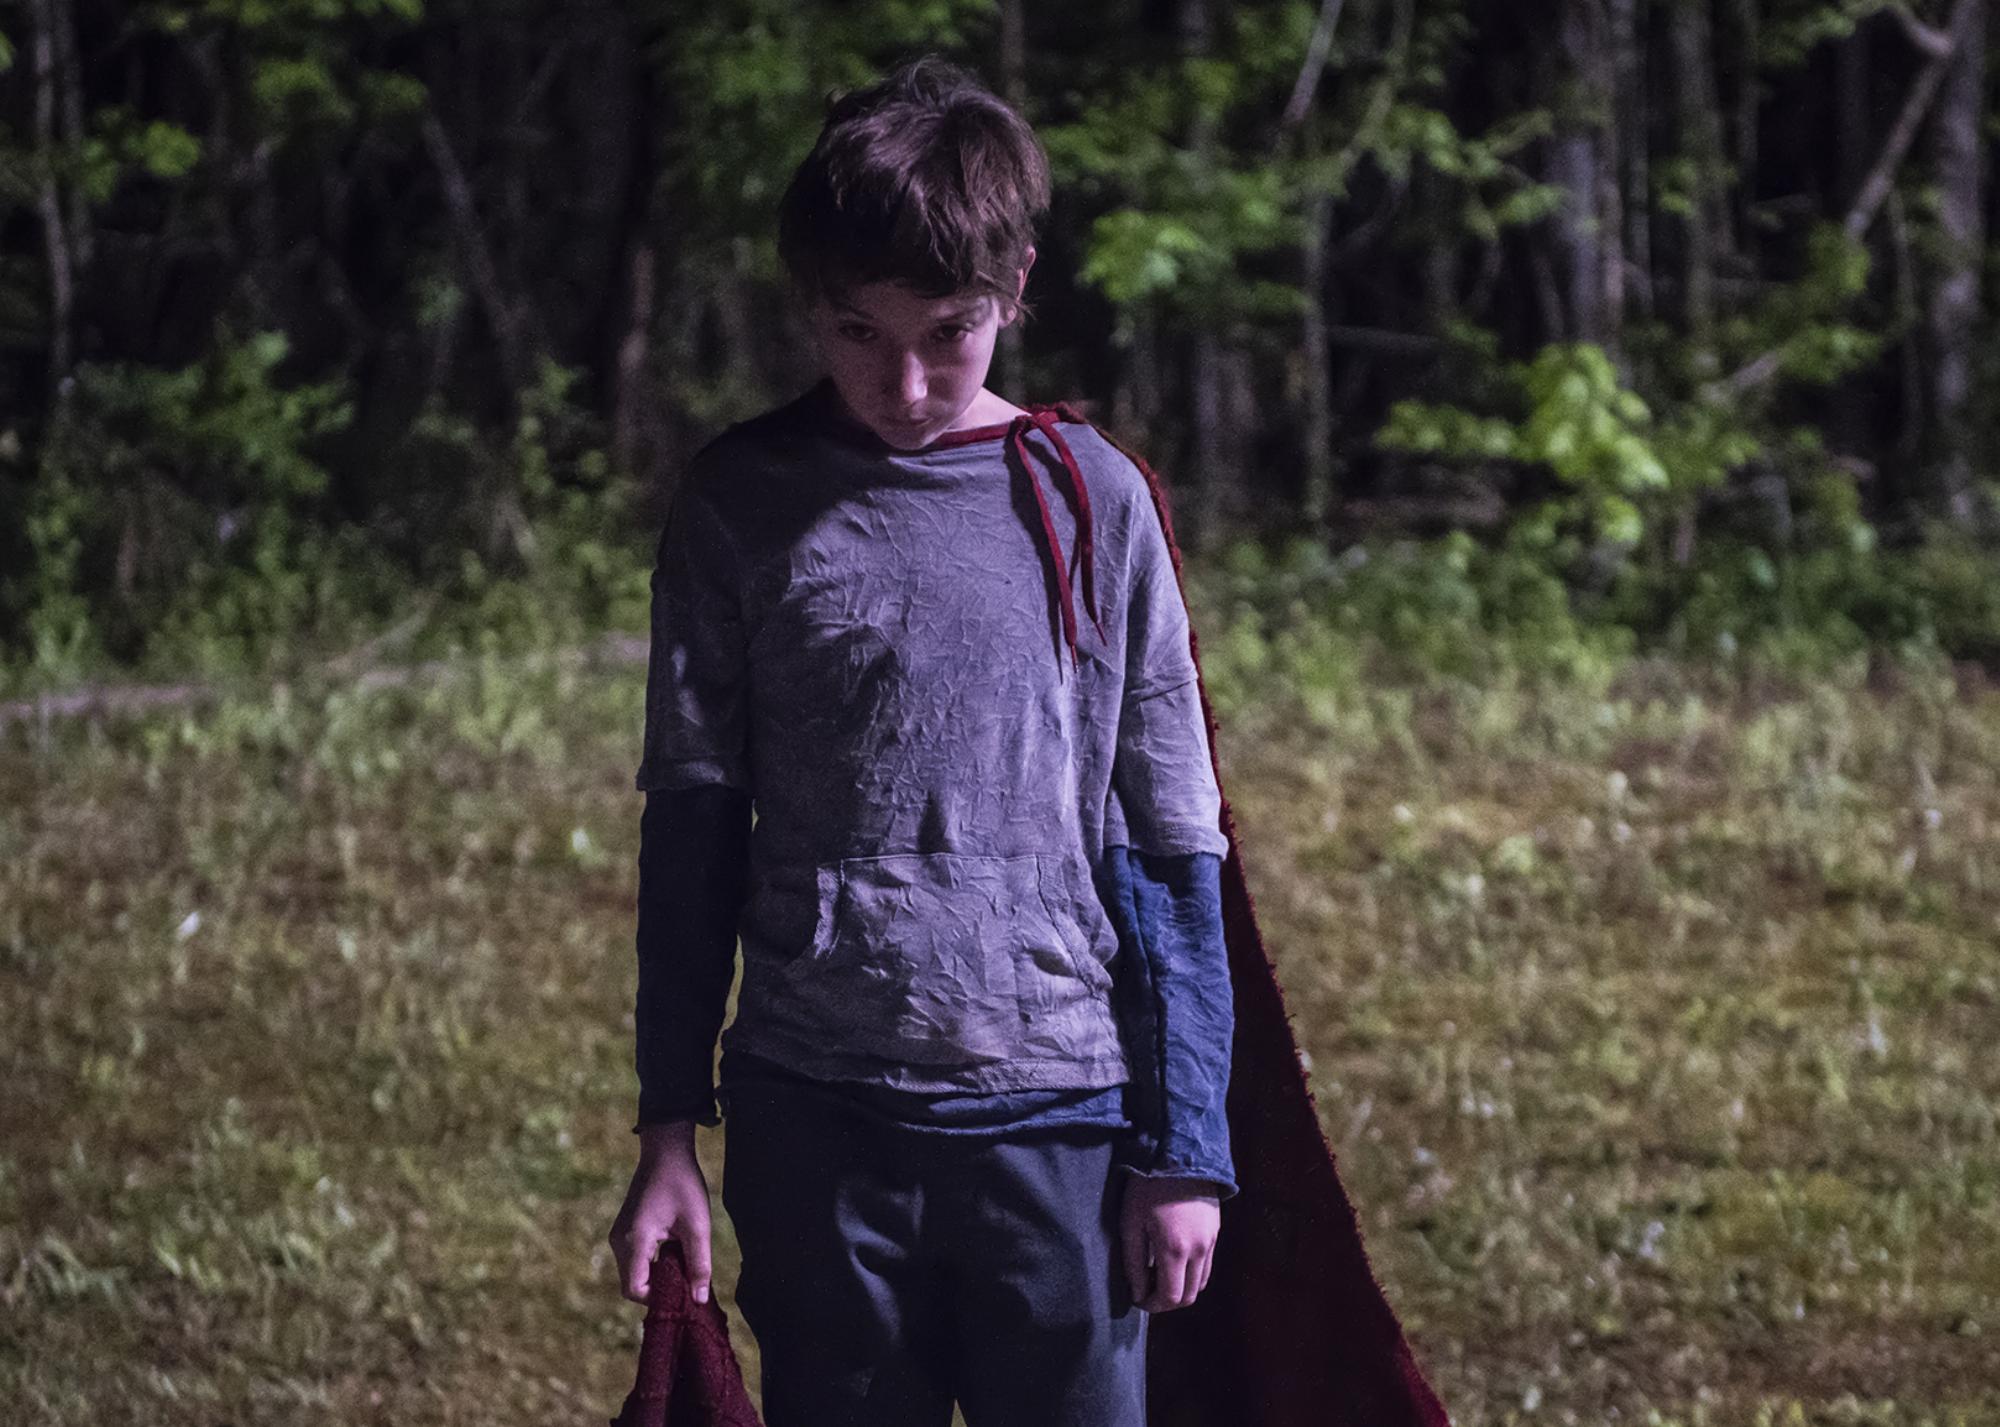 Movie Poster 2019: Brightburn: The Thin Line Between Hero And Villain